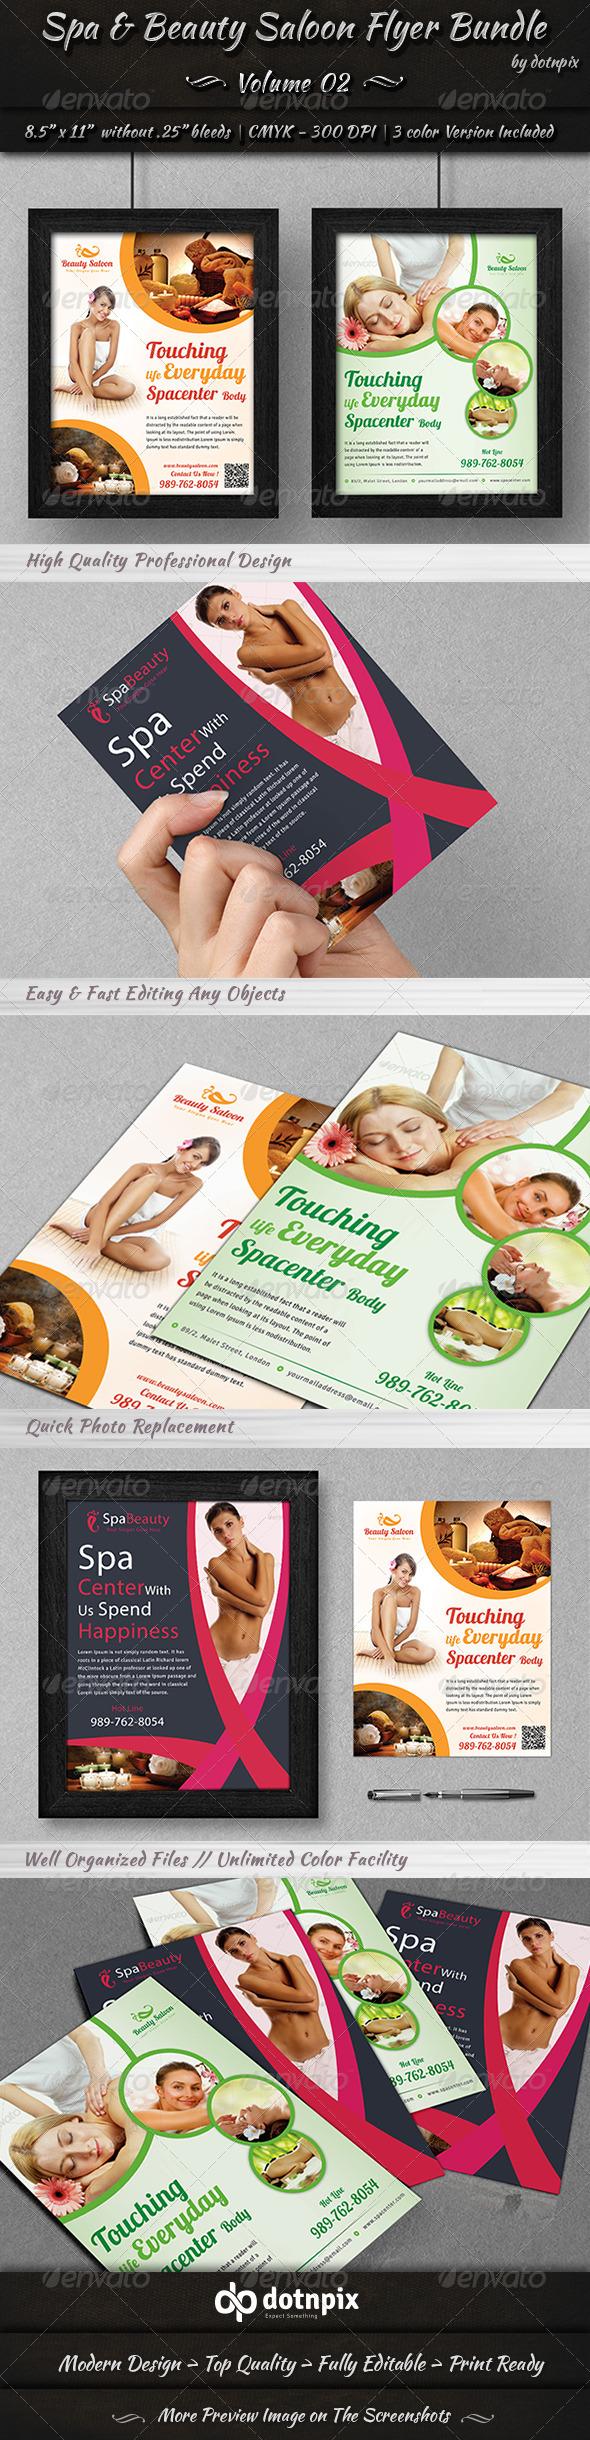 Spa & Beauty Saloon Flyer Bundle | Volume 2 - Corporate Flyers